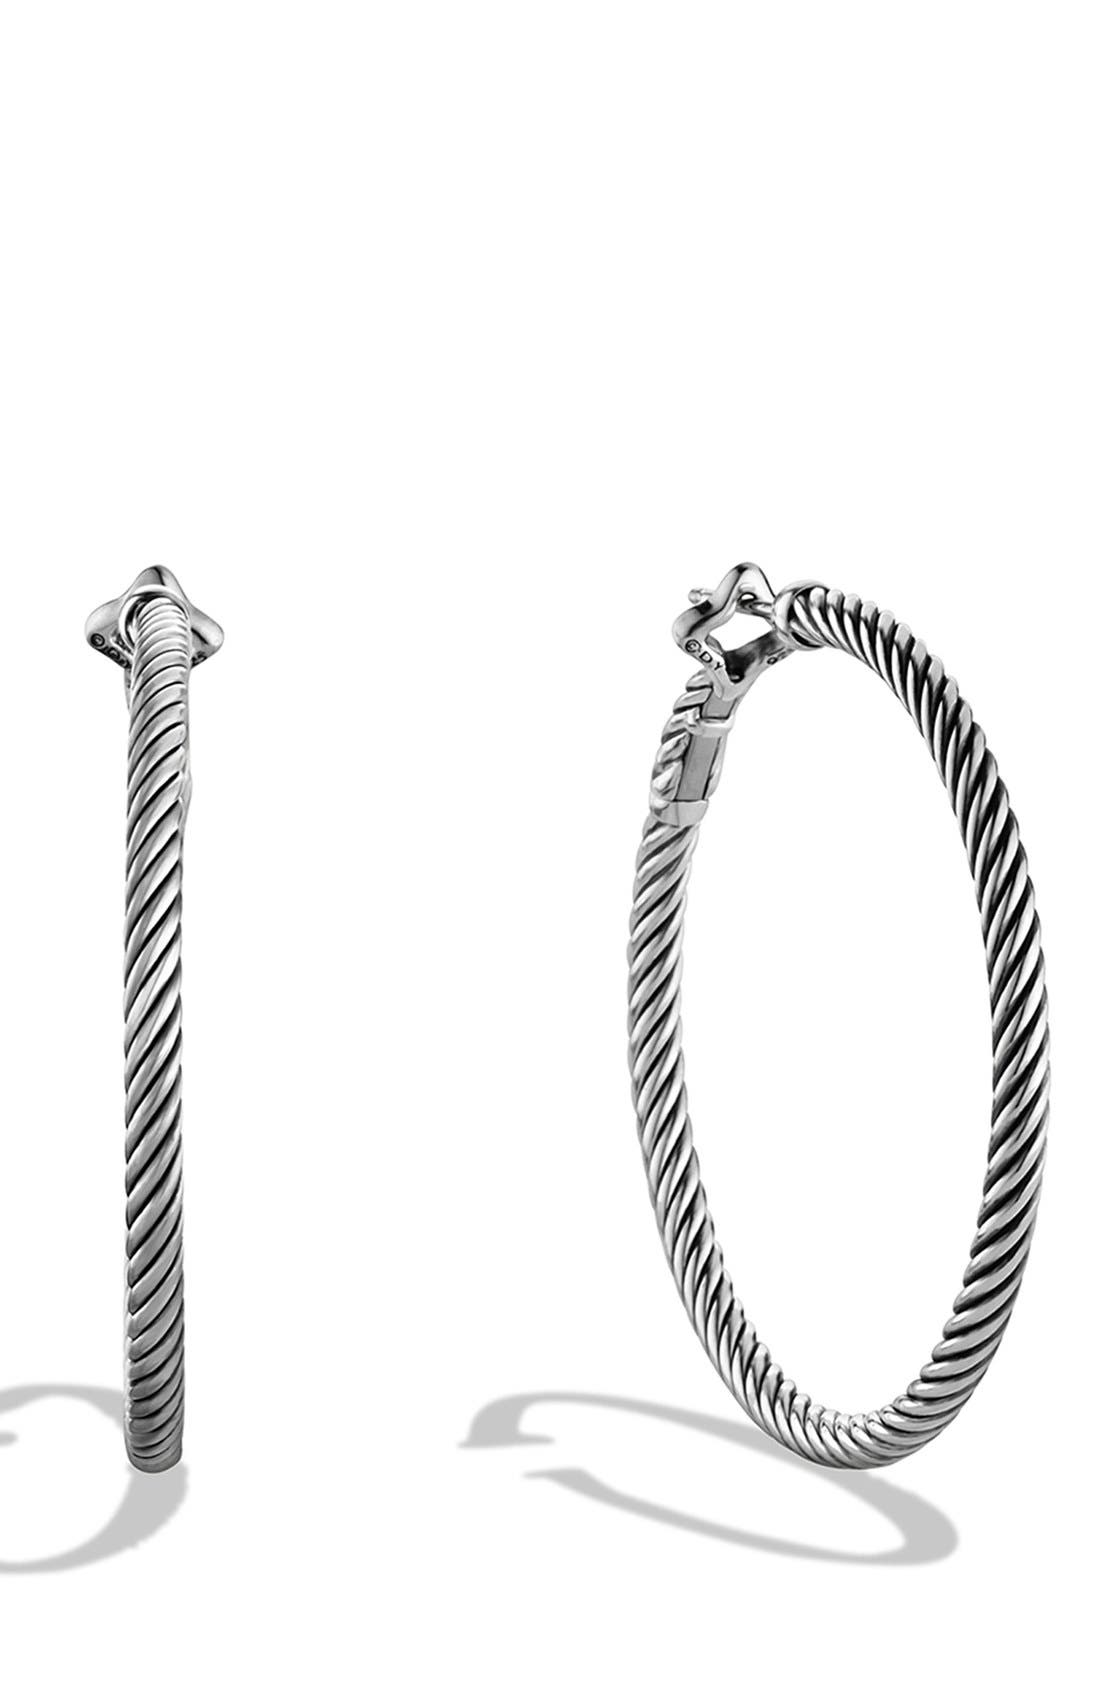 'Cable Classics' Large Hoop Earrings,                             Main thumbnail 1, color,                             SILVER